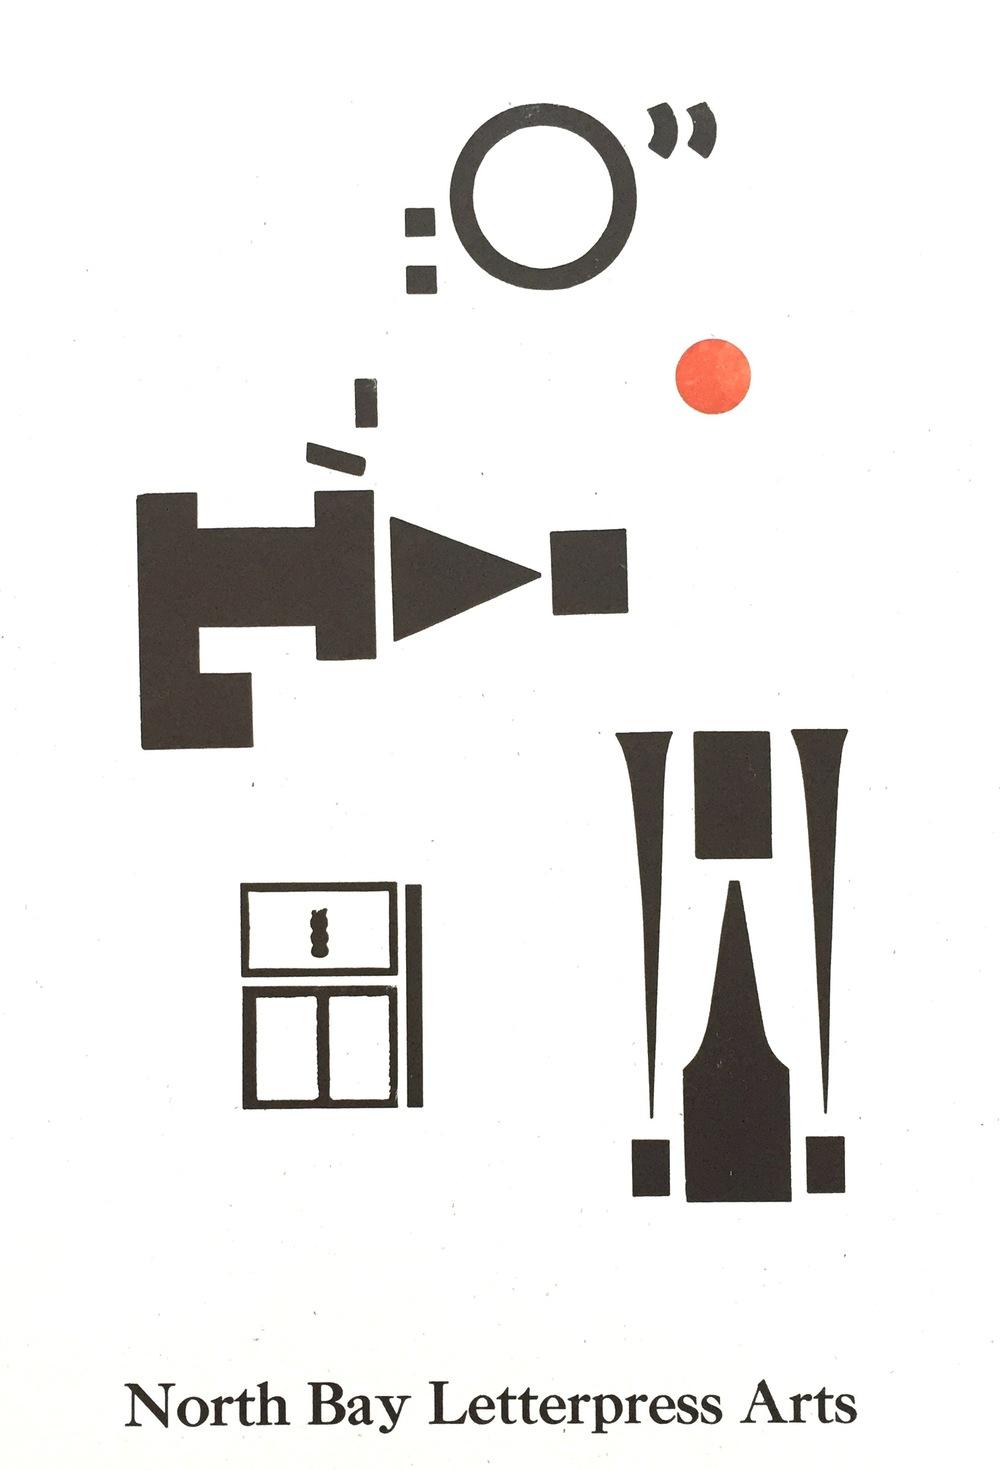 nothbay letterpress arts poster